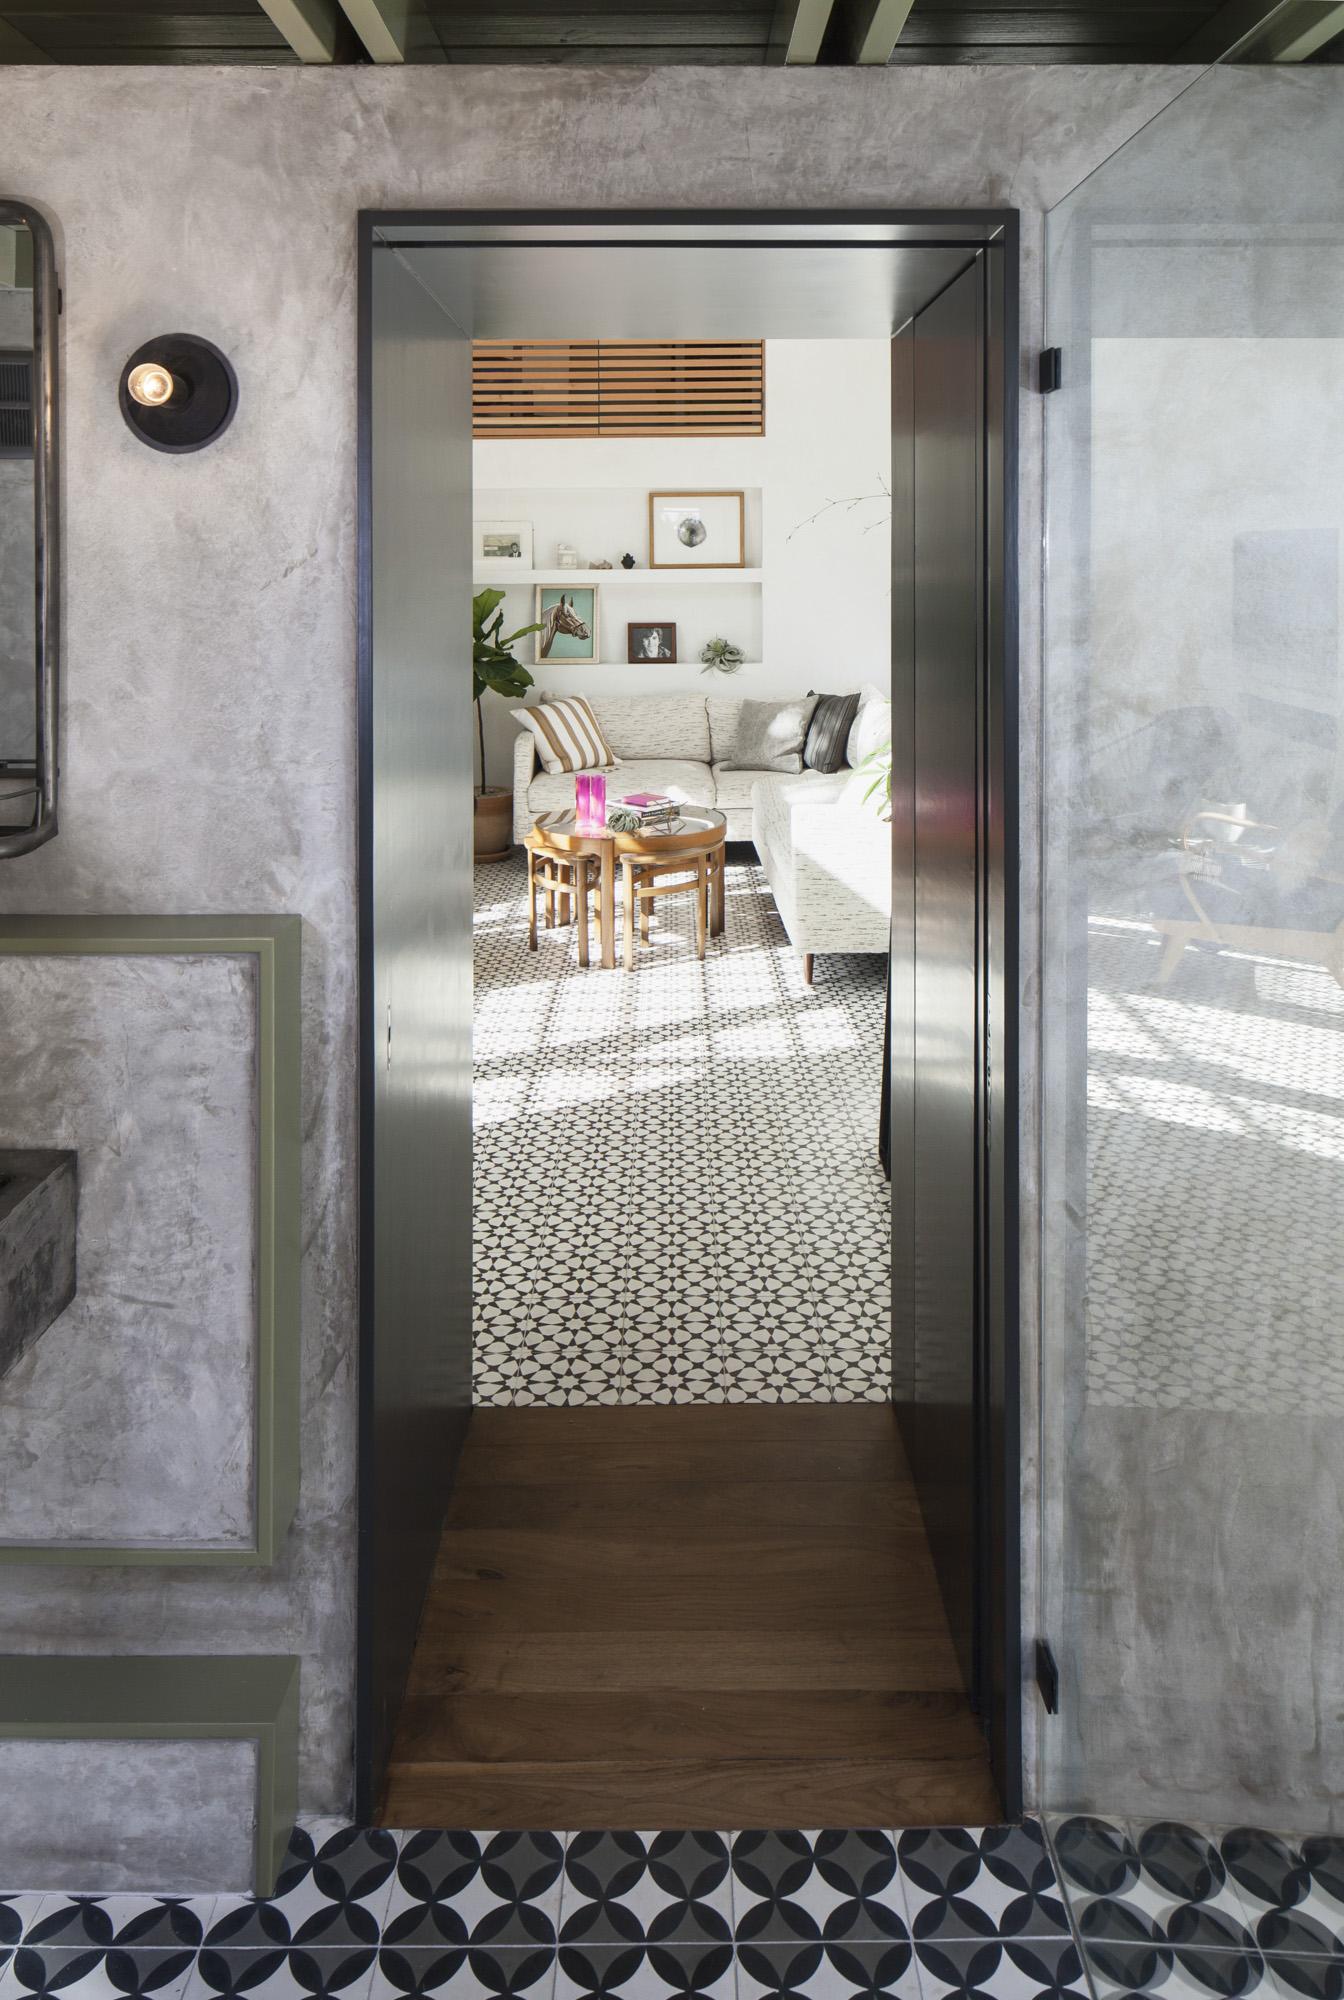 Elizabeth-Baird-Architecture-Garner Pool and Casita- bathroom to livingroom.jpg